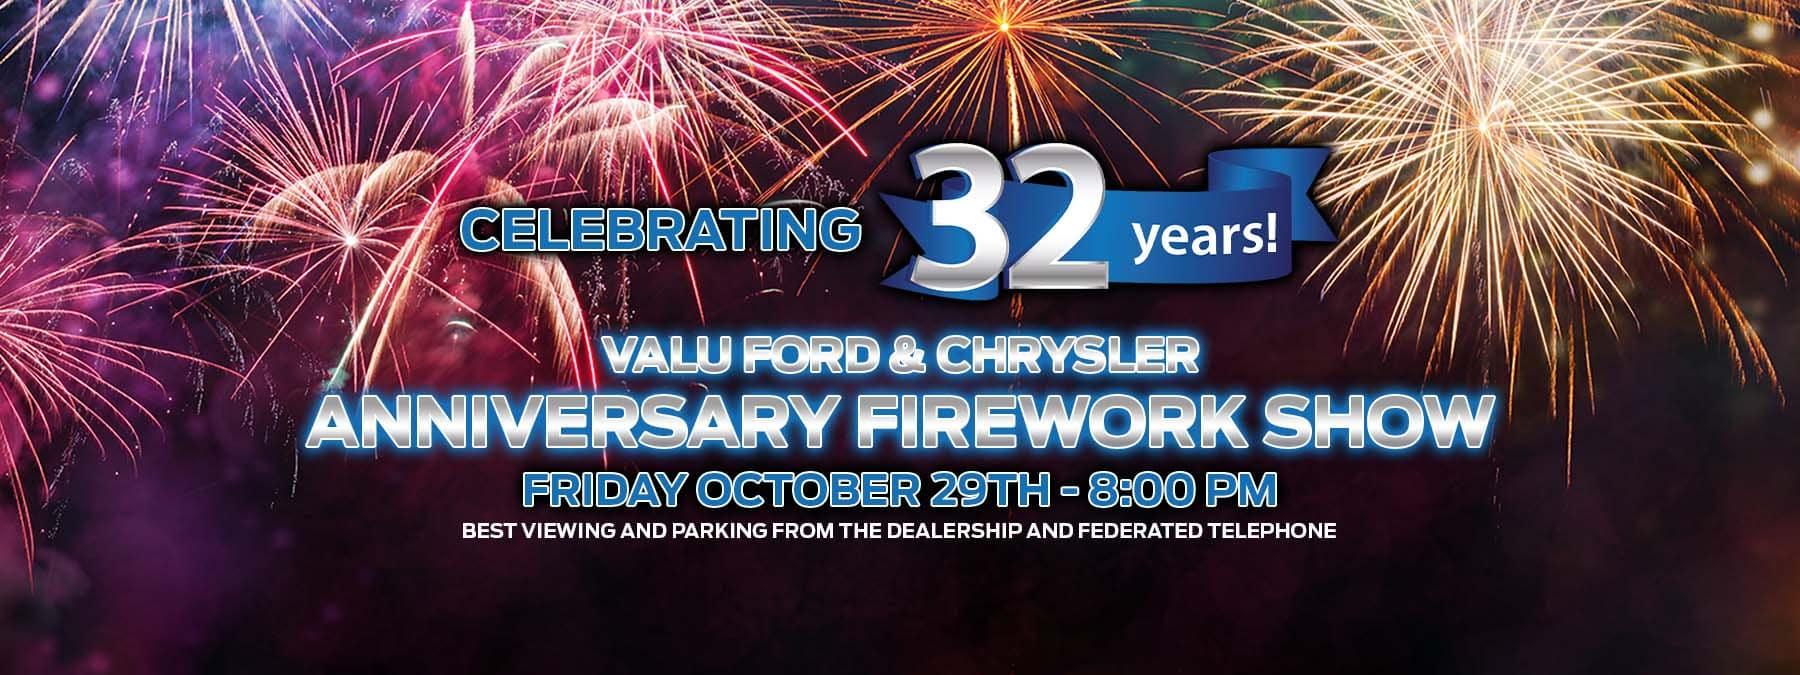 Anniversary Firework Show